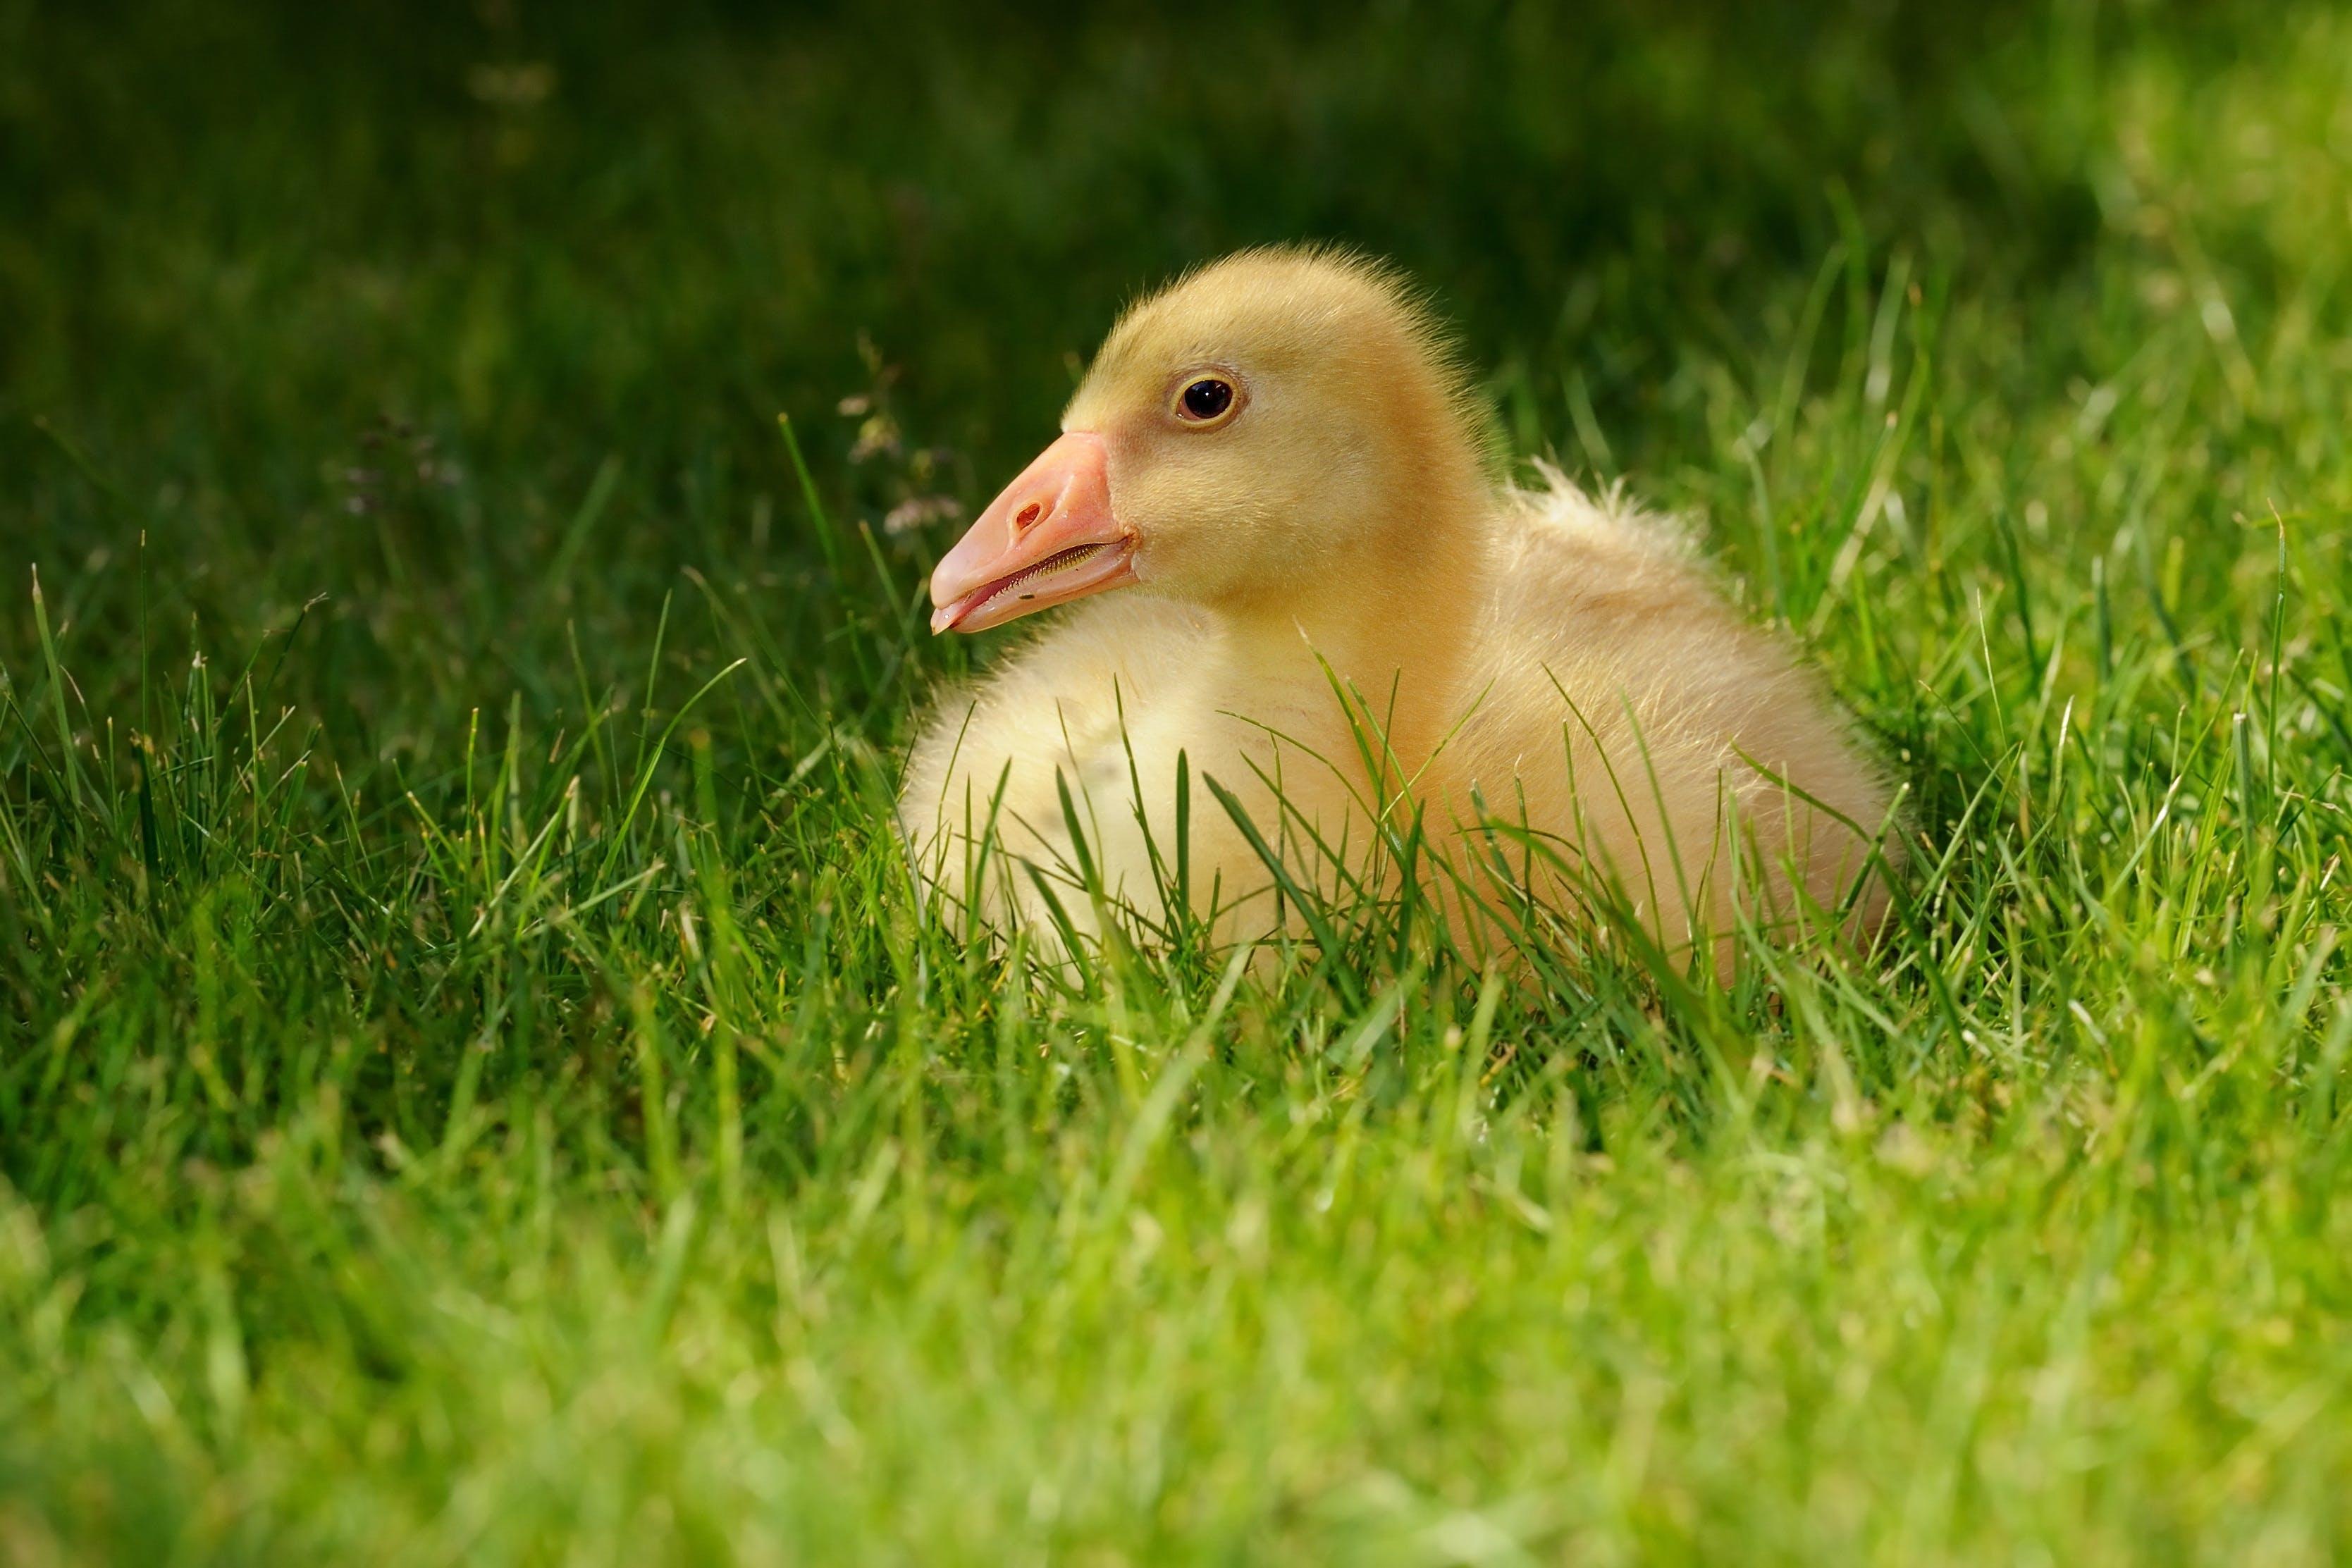 animal, bird, cute